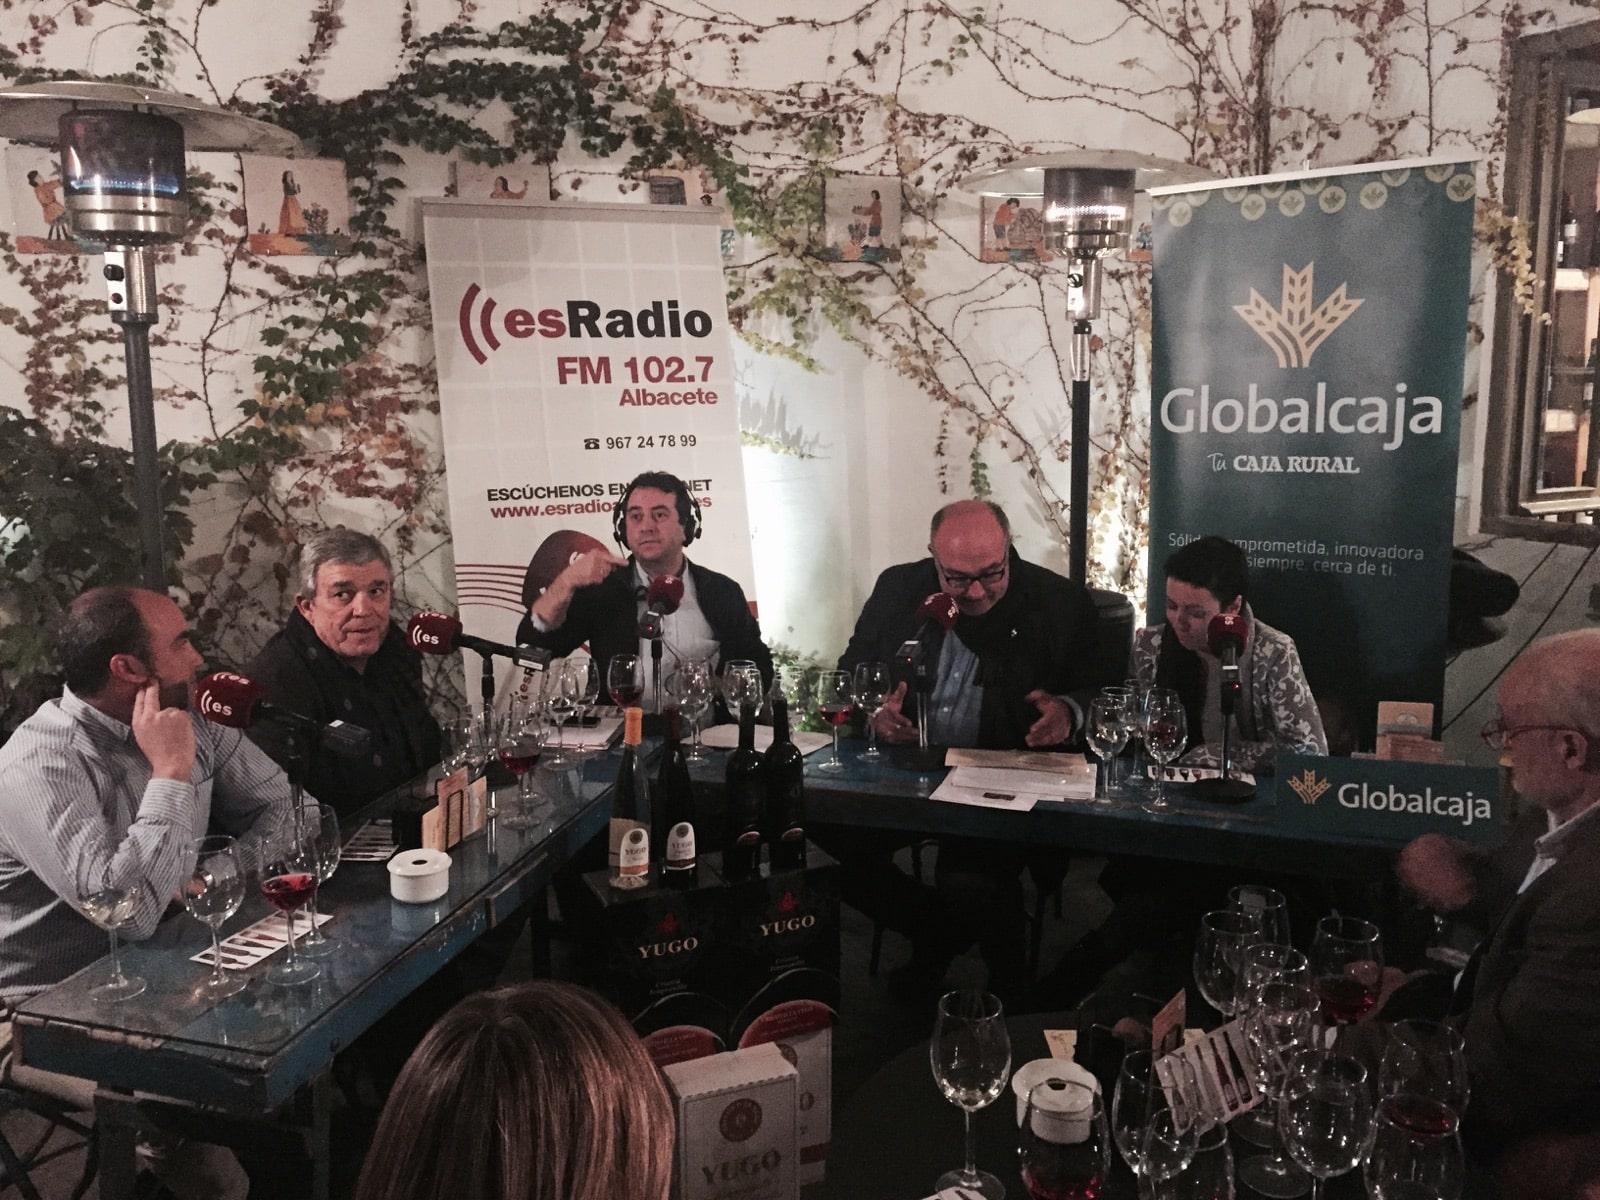 https://blog.globalcaja.es/wp-content/uploads/2015/12/vino-es-radio-.jpg